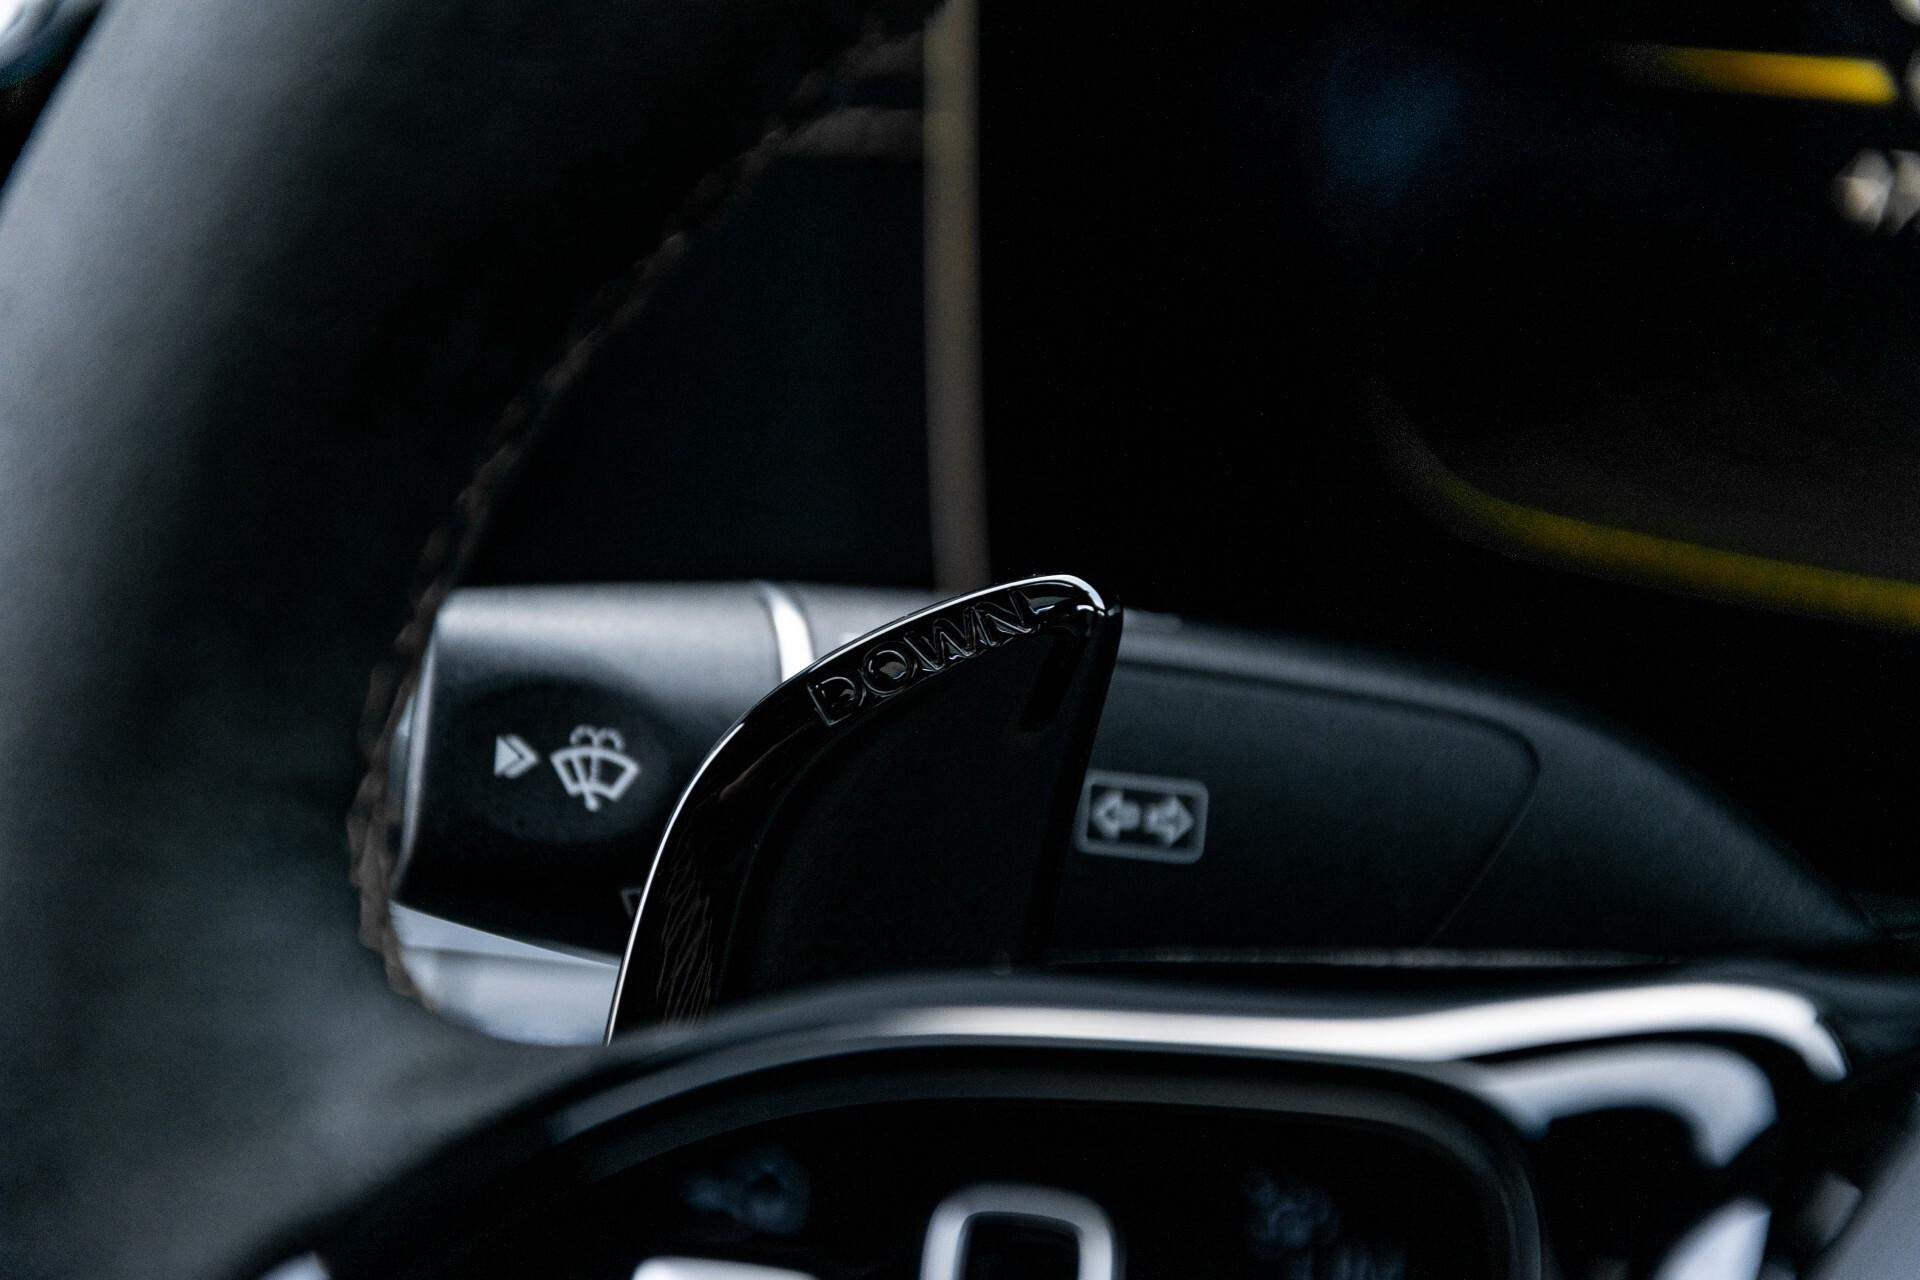 Mercedes-Benz AMG GT 4-Door Coupe 63 S 4MATIC+ Edition 1 Keramisch/Carbon/First Class/Dynamic Plus/Burmester High End 3D Aut9 Foto 13